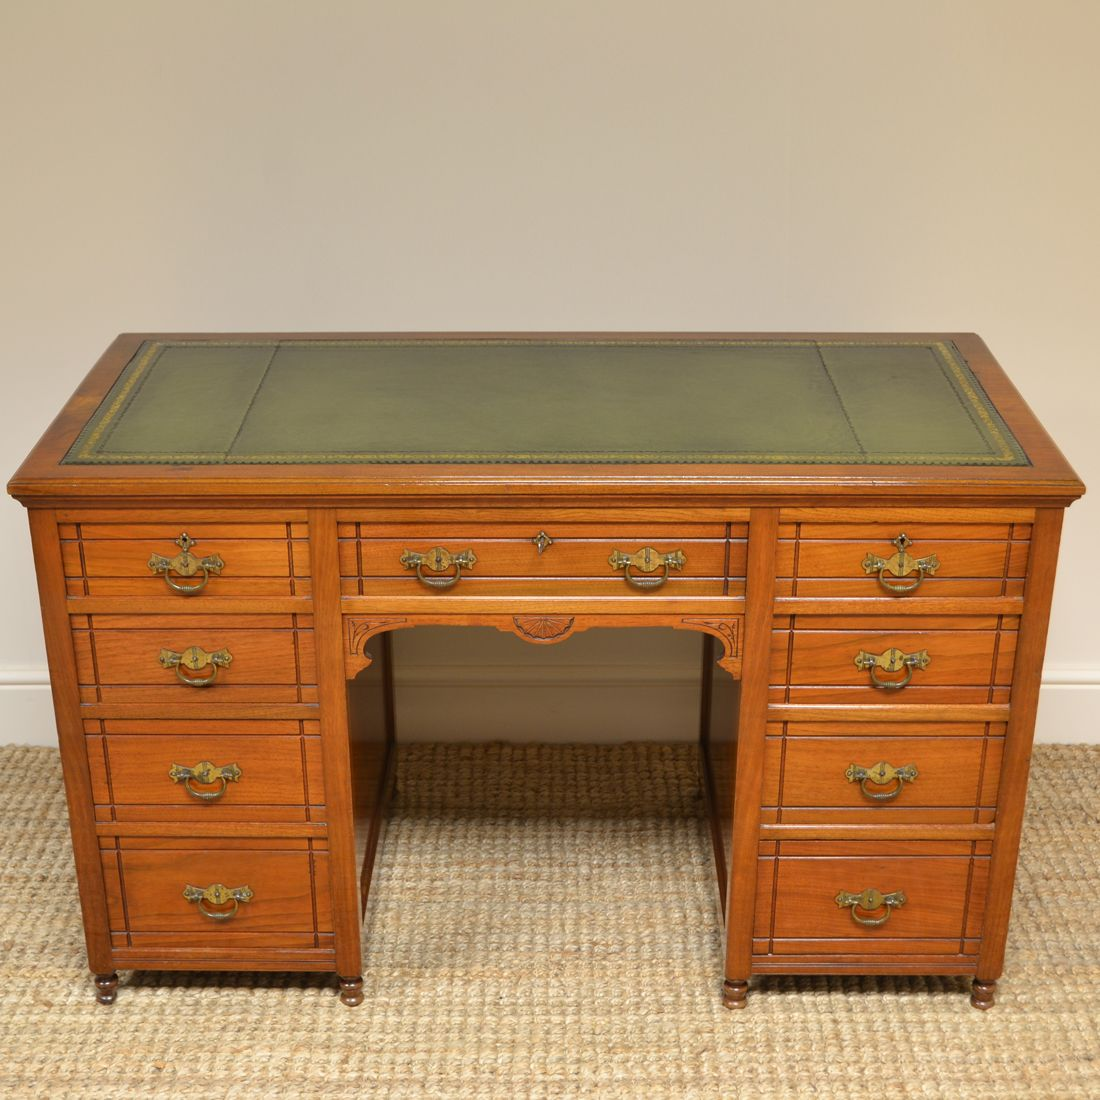 Quality Victorian Walnut Antique Pedestal Desk Antiques World Antique Desk Antique Pedestal Desk Pedestal Desk